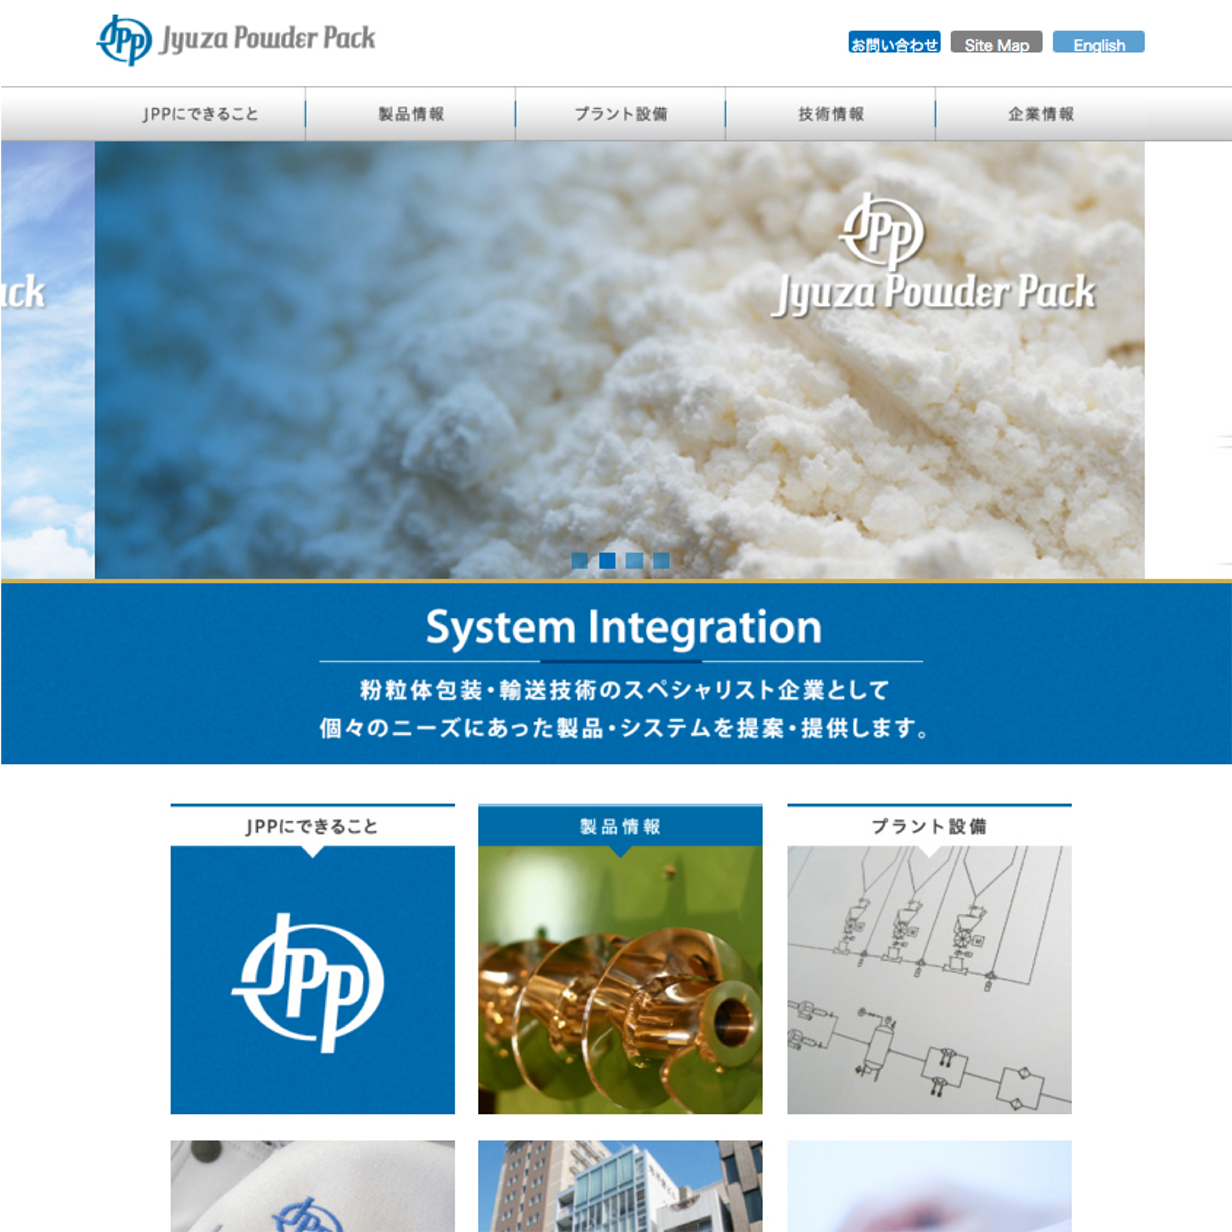 JPP ホームページ